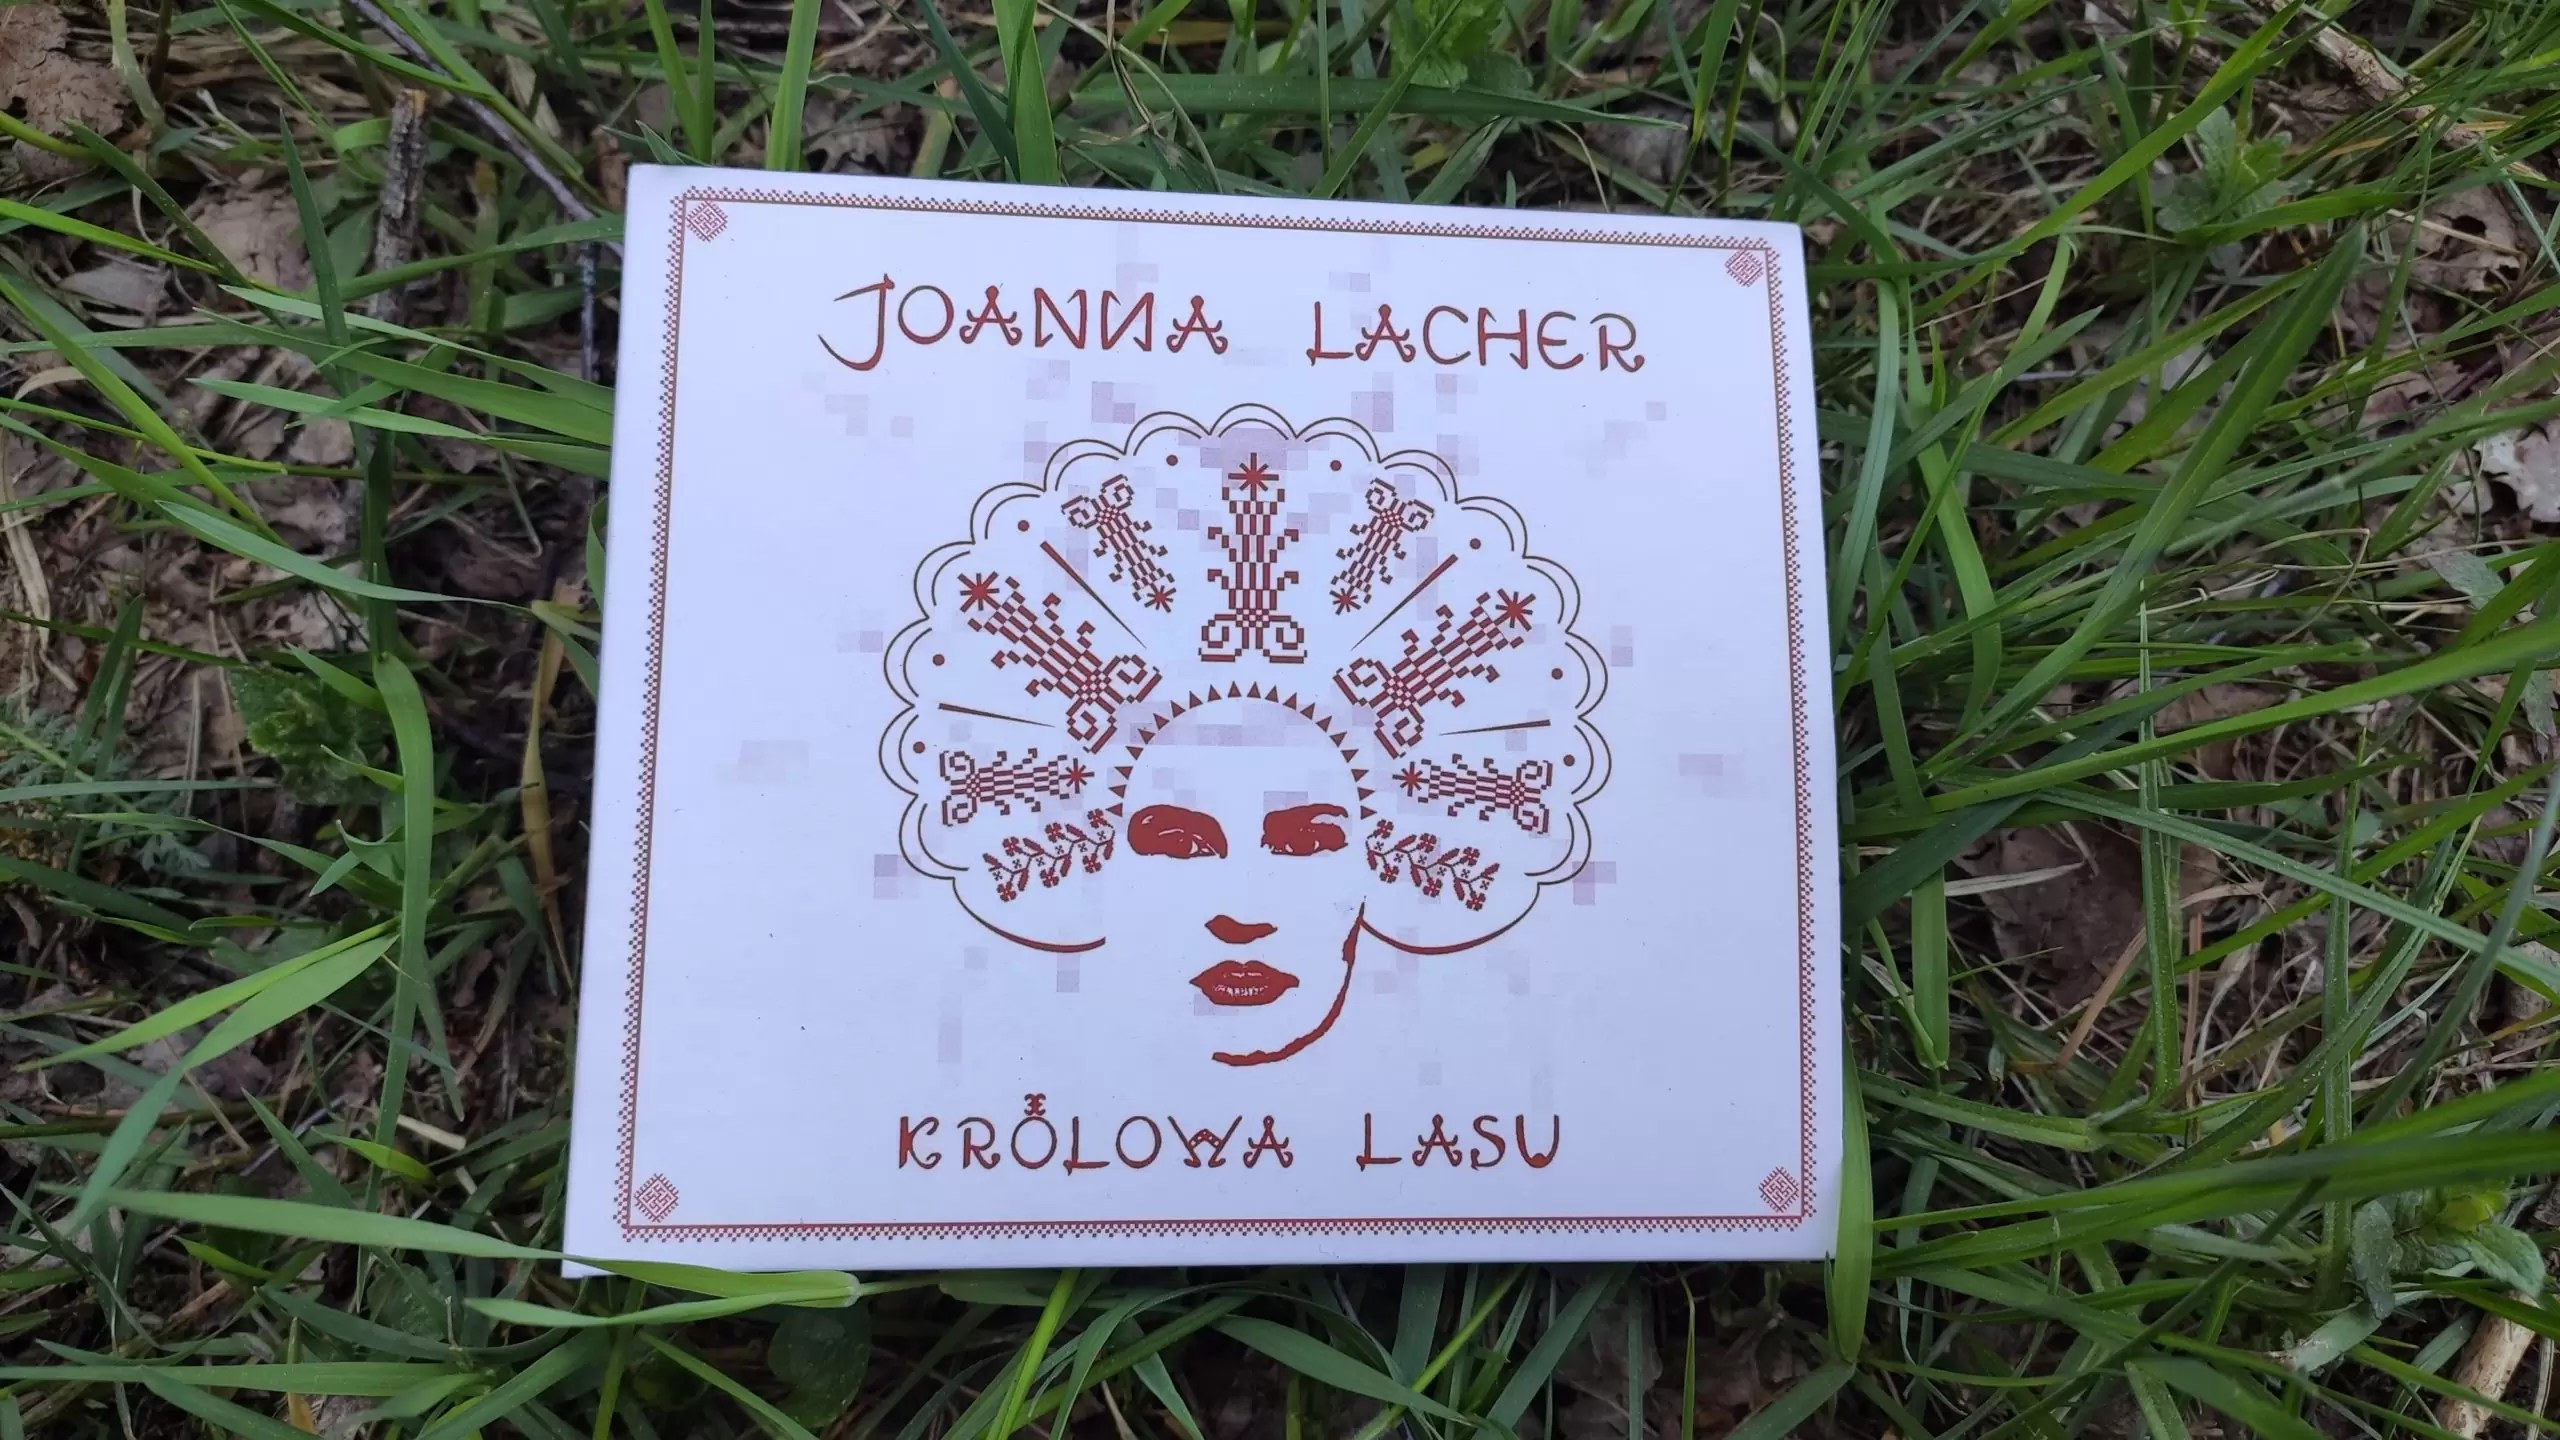 Królowa Lasu Joanna Lacher